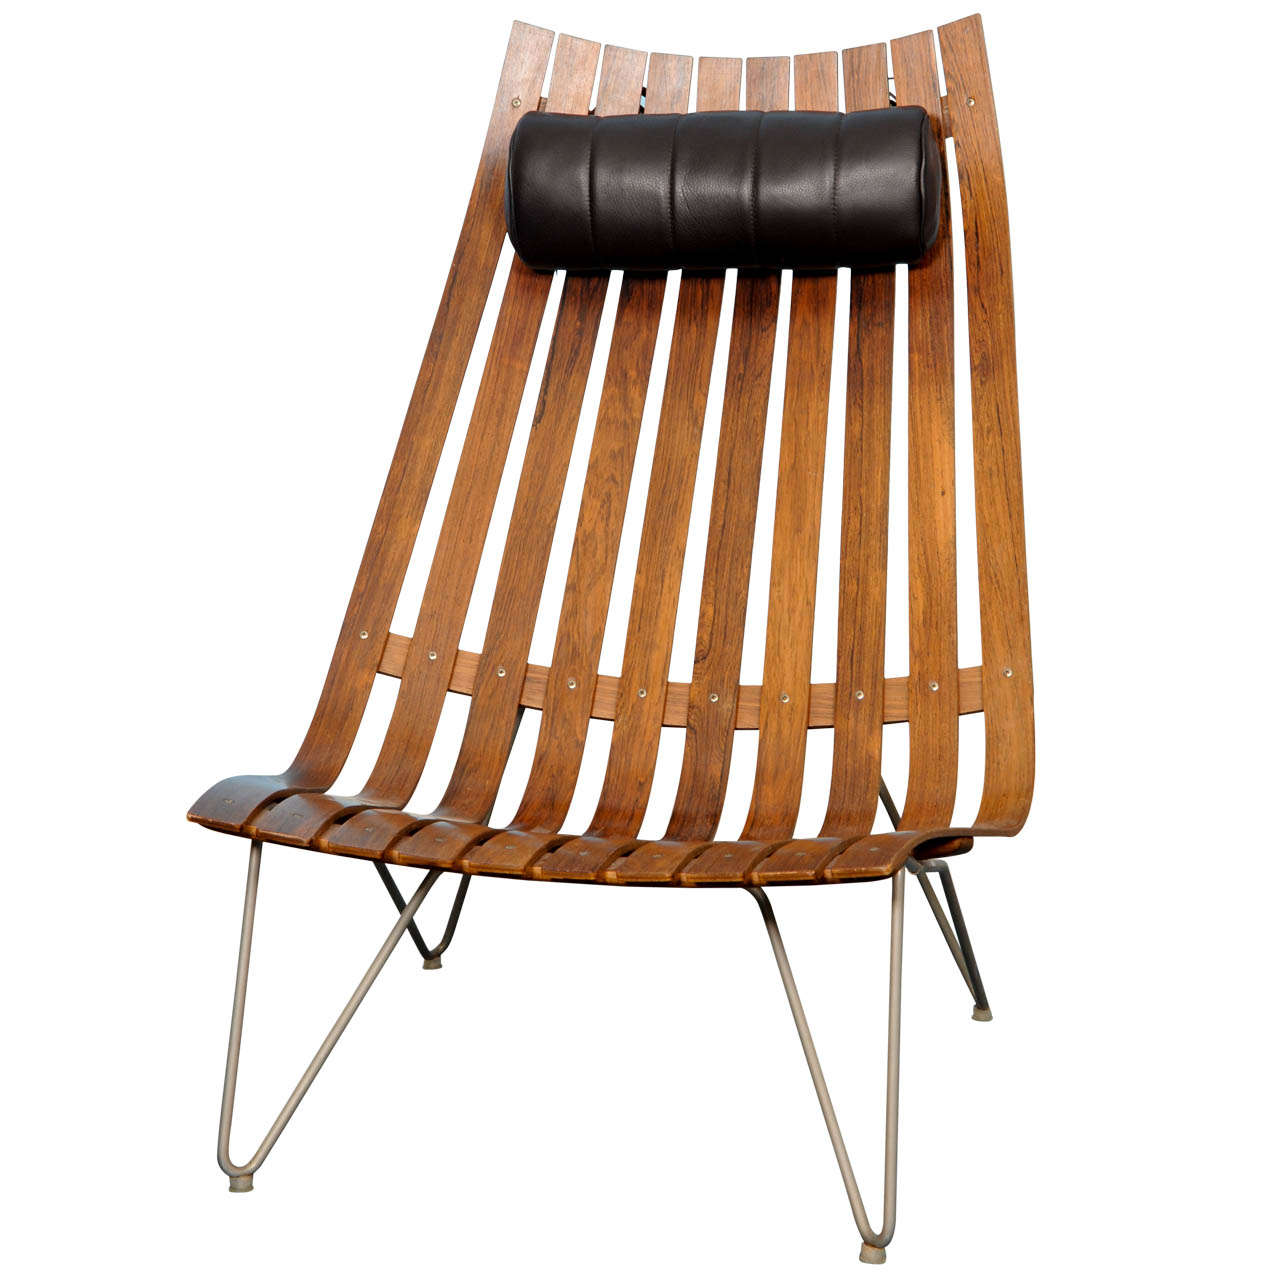 Hans Brattrud Scandia Senior Lounge Chair At 1stdibs